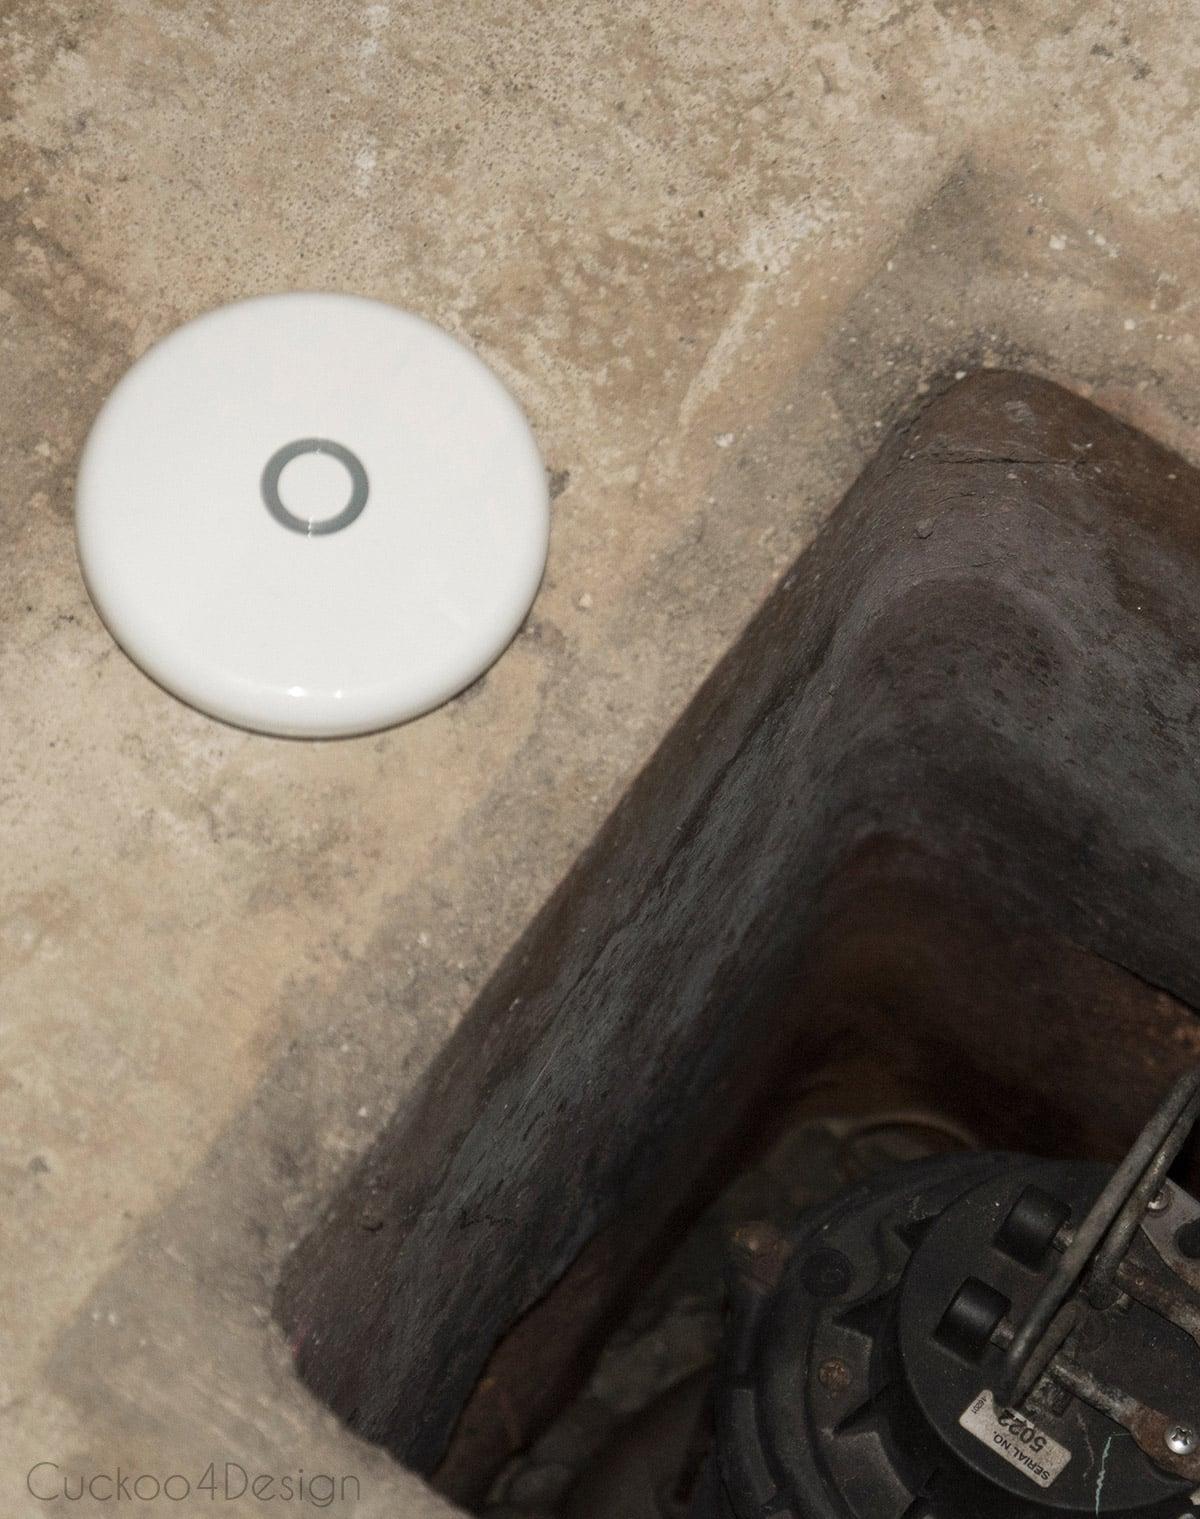 water leak detector next to sump pump